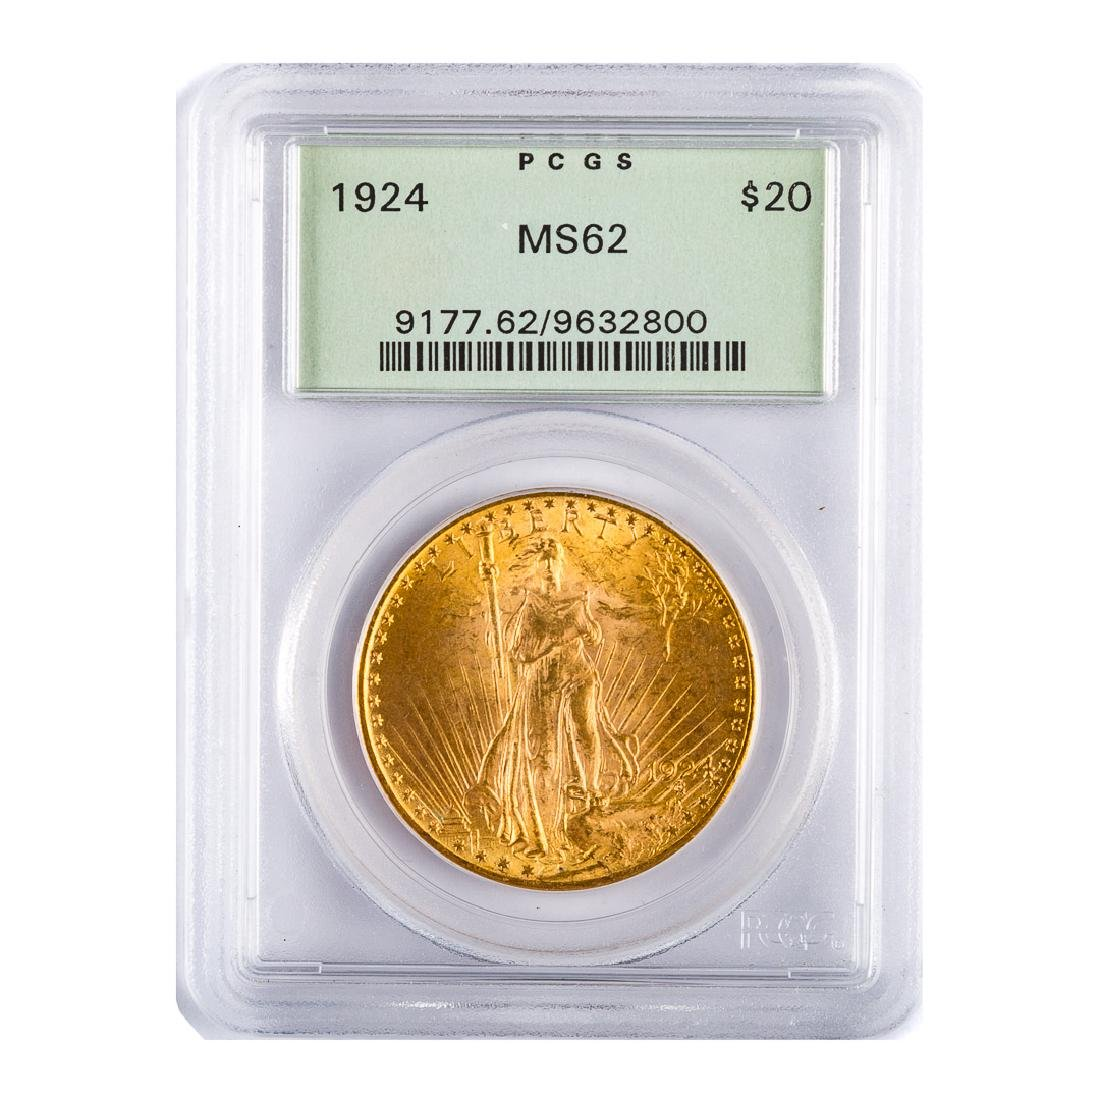 [US] 1924 $20 St. Gaudens PCGS MS62 OGH